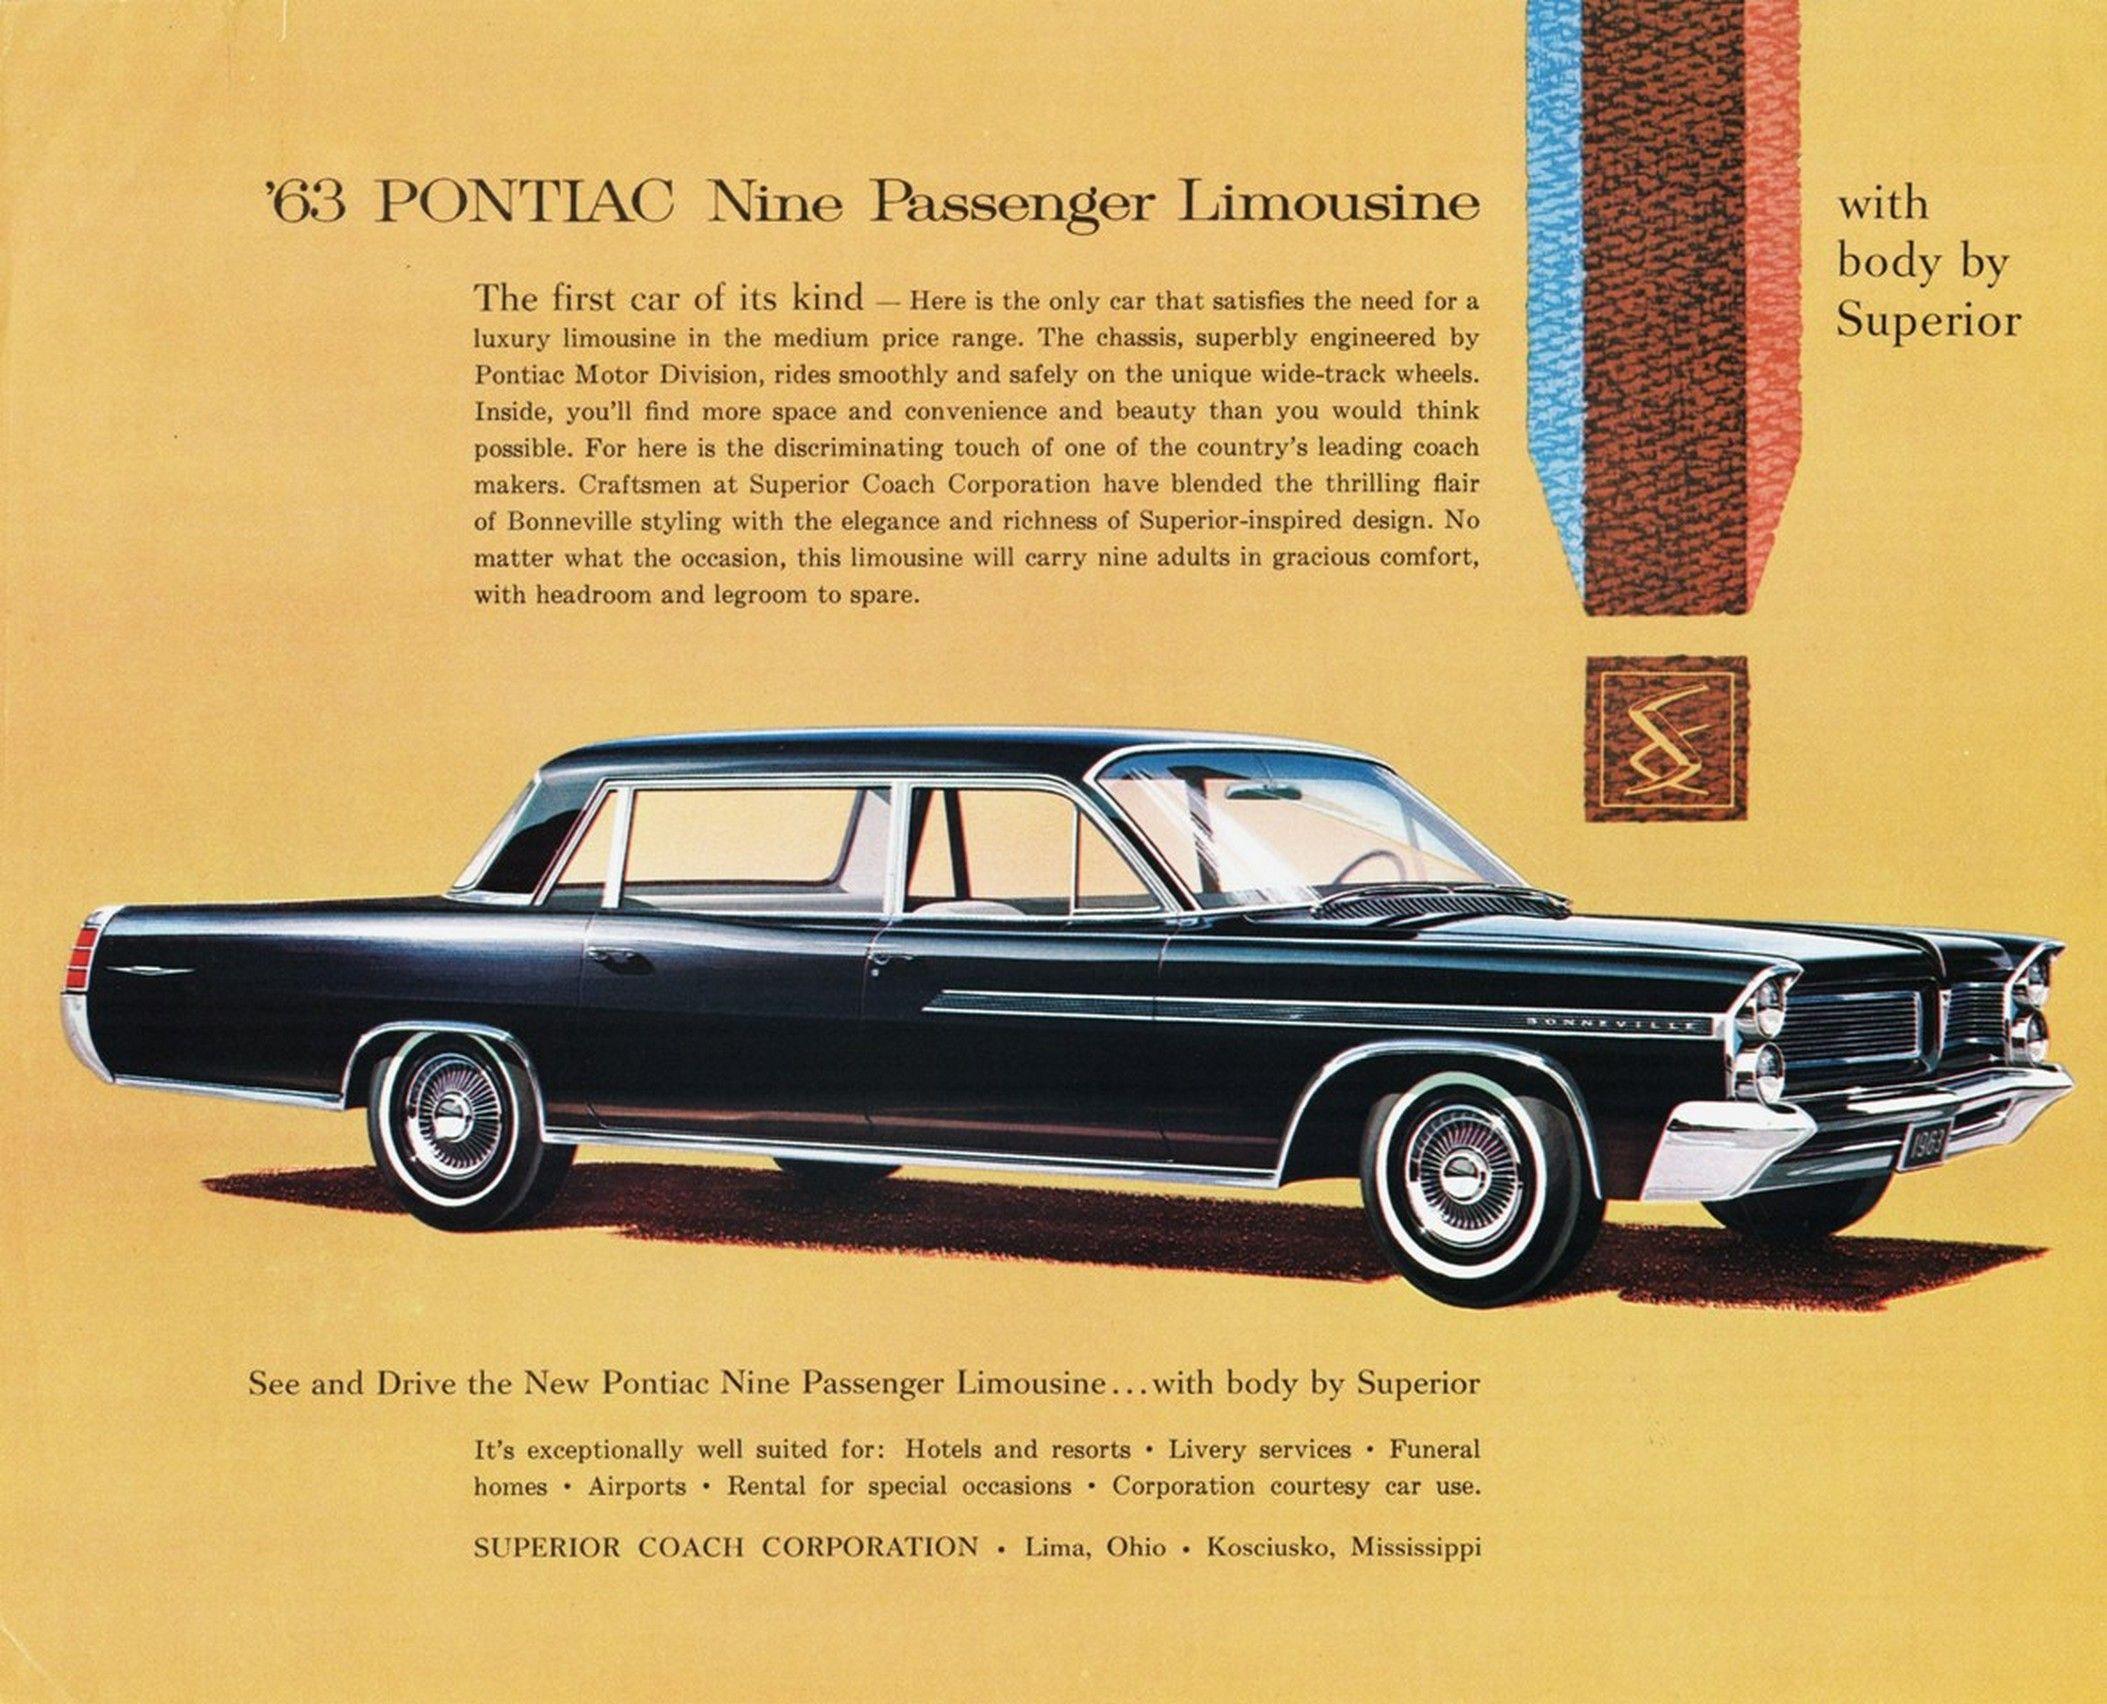 http://media.digitalpostercollection.com/2015/10/1963-Pontiac-Nine-Passenger-Limousine-by-Superior.jpg